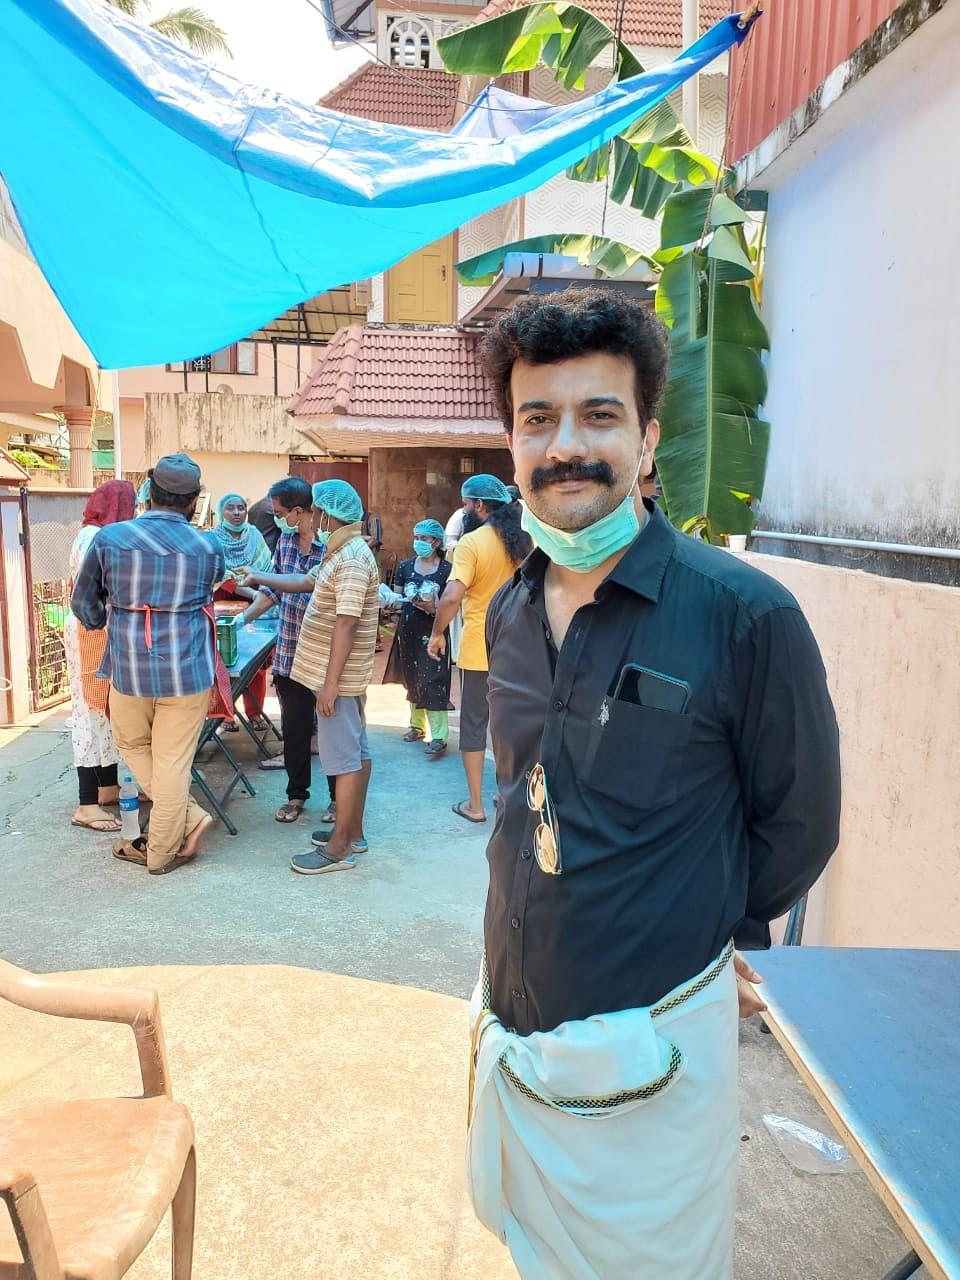 Actor Ramesh Pisharody at the kitchen community run by film fraternity in Kochi